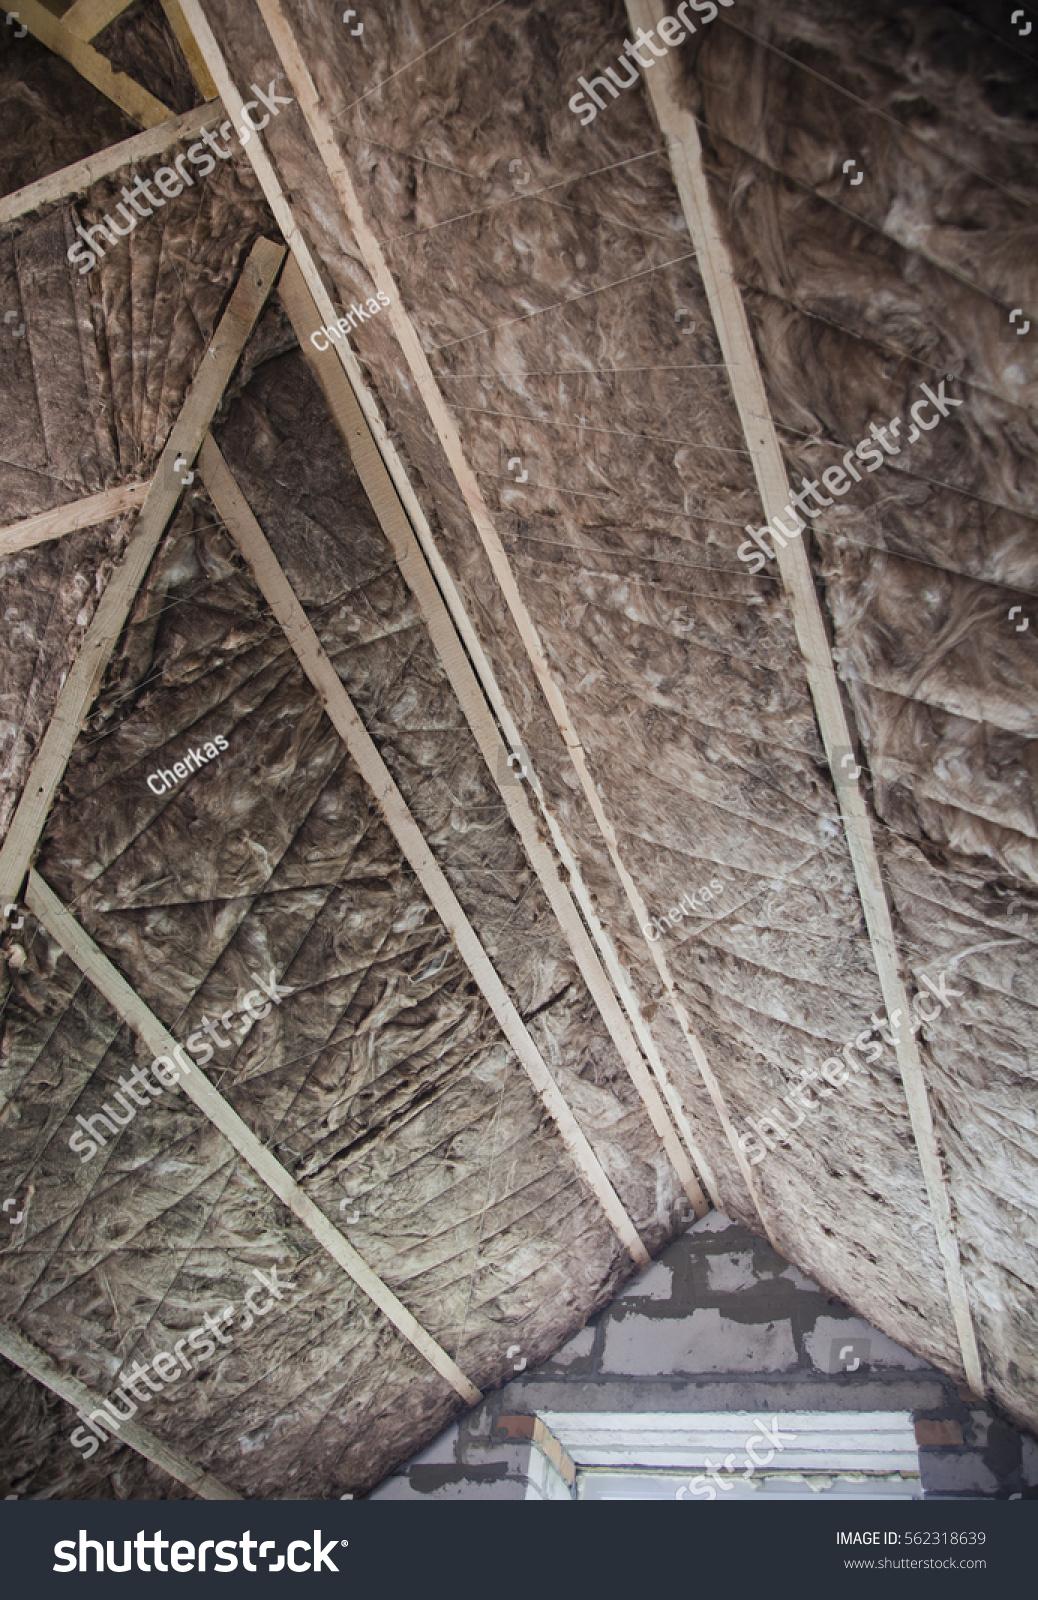 Thermal insulation glass wool attic stockfoto 562318639 shutterstock - Attic thermal insulation ...